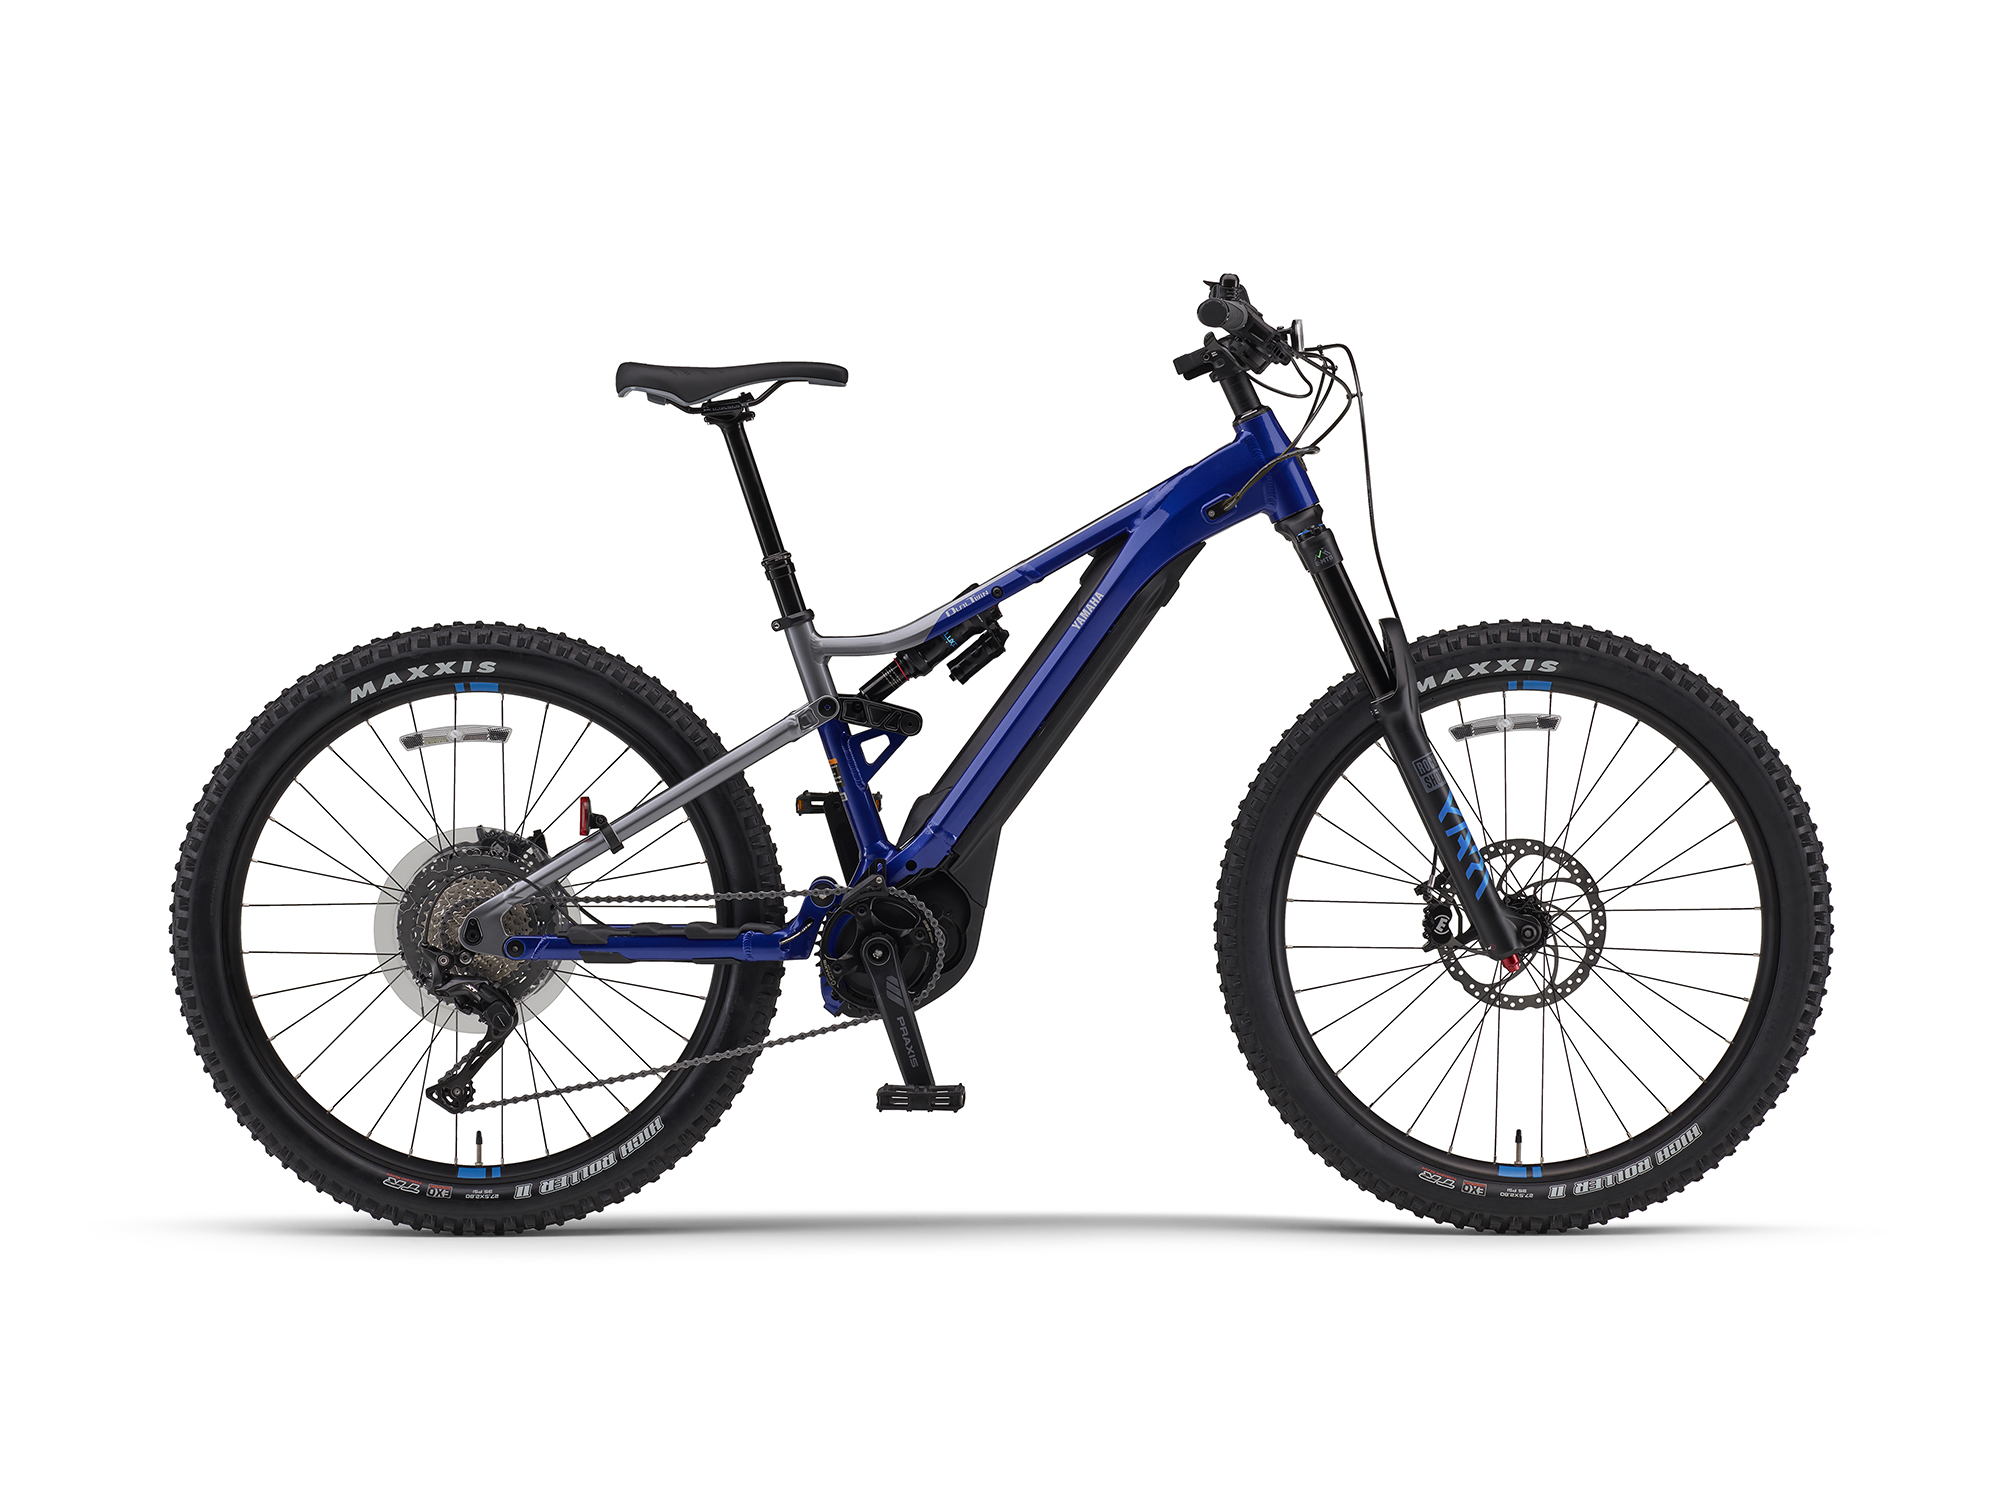 200805 2020-ydx-moro-pro-blue-nickel-usa-1